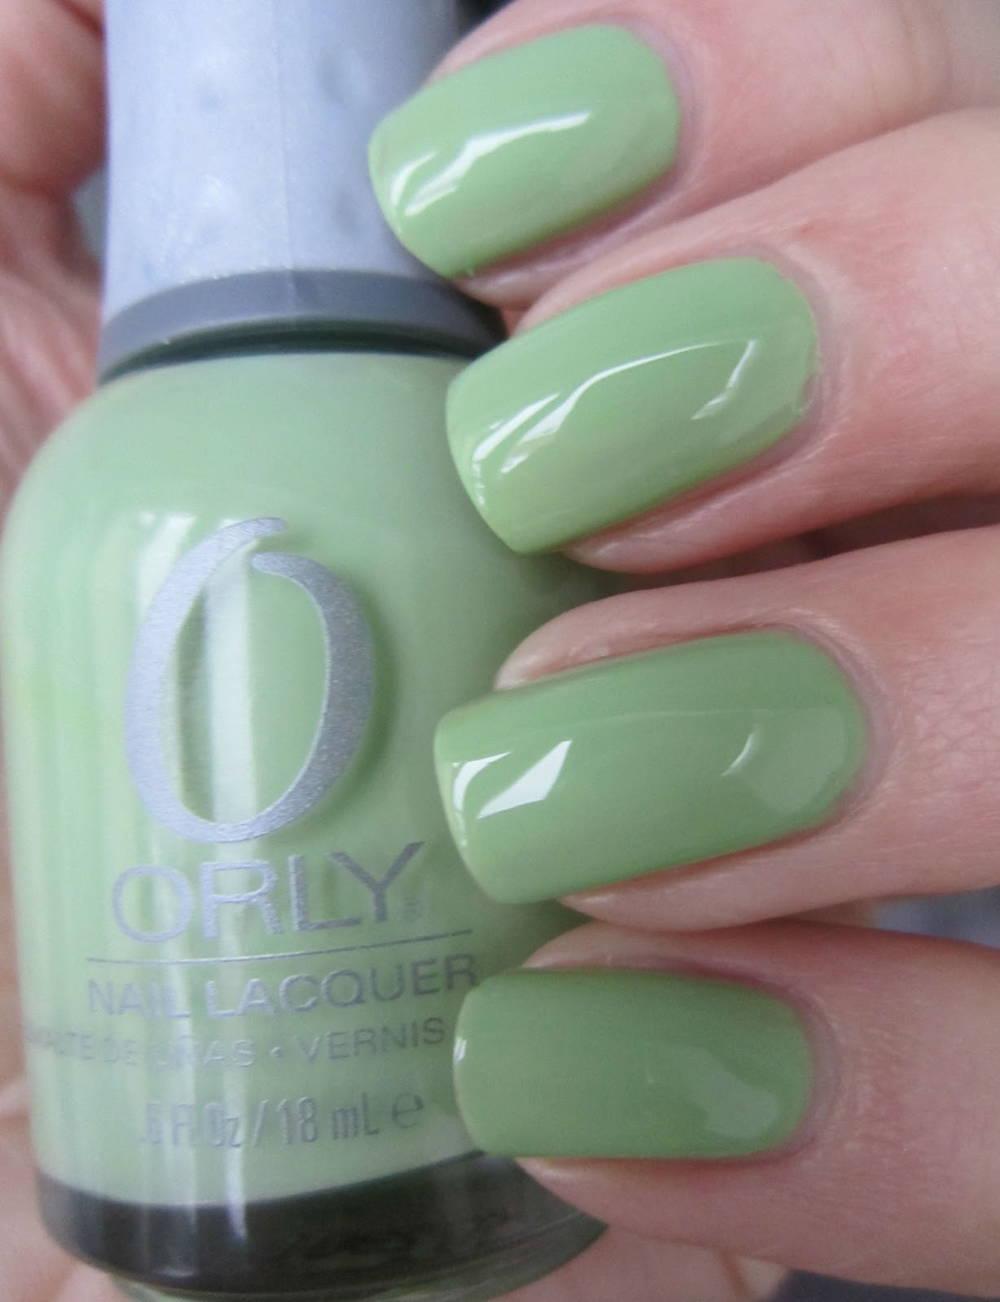 Orly Coachella dweller nail